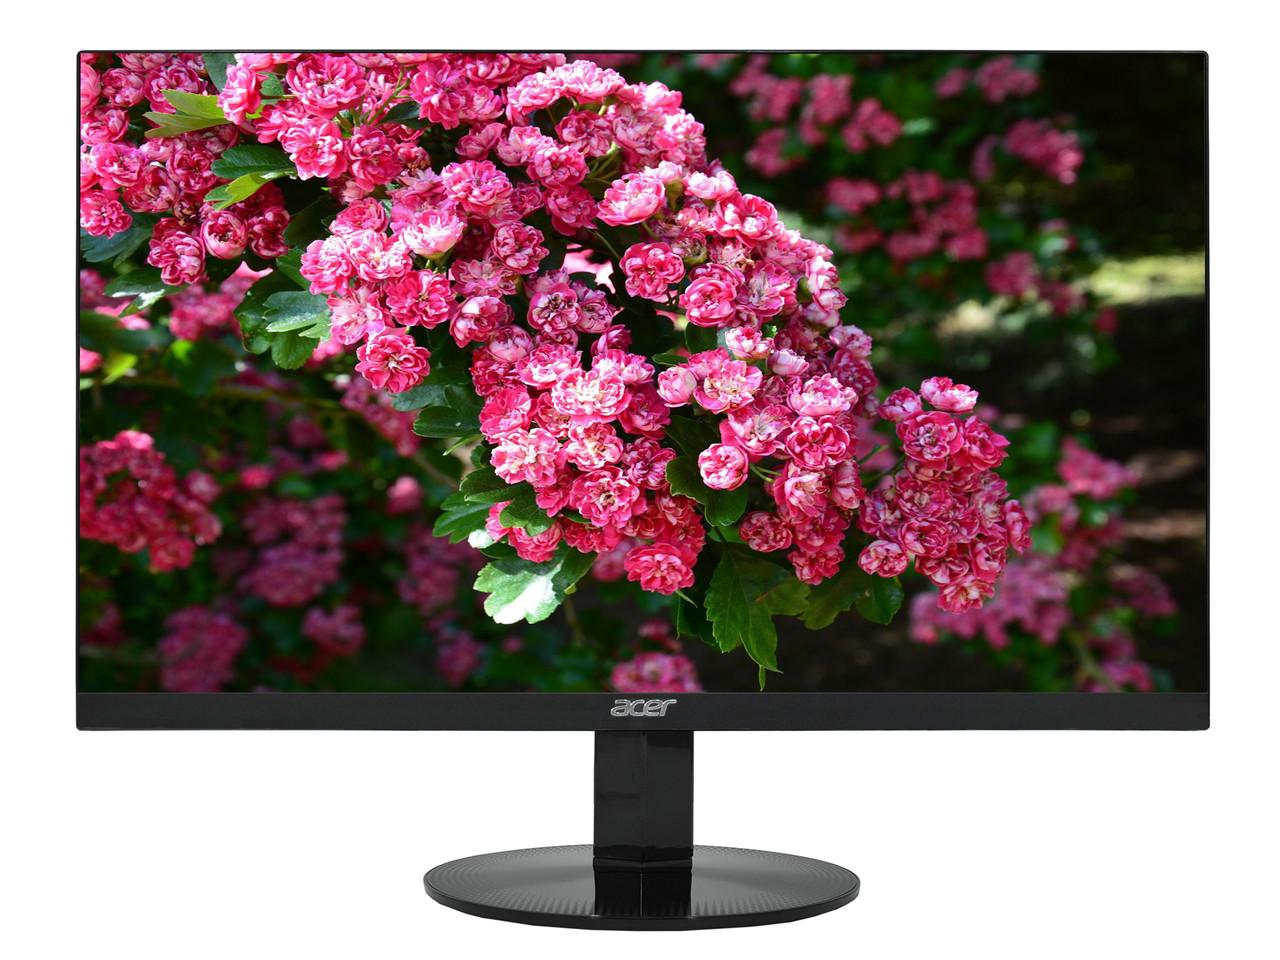 "Монитор Acer SA240YAbi LCD 23.8"" 1920x1080 IPS (LED), 4ms, 250 cd/m2, 1000:1, VGA/HDMI"